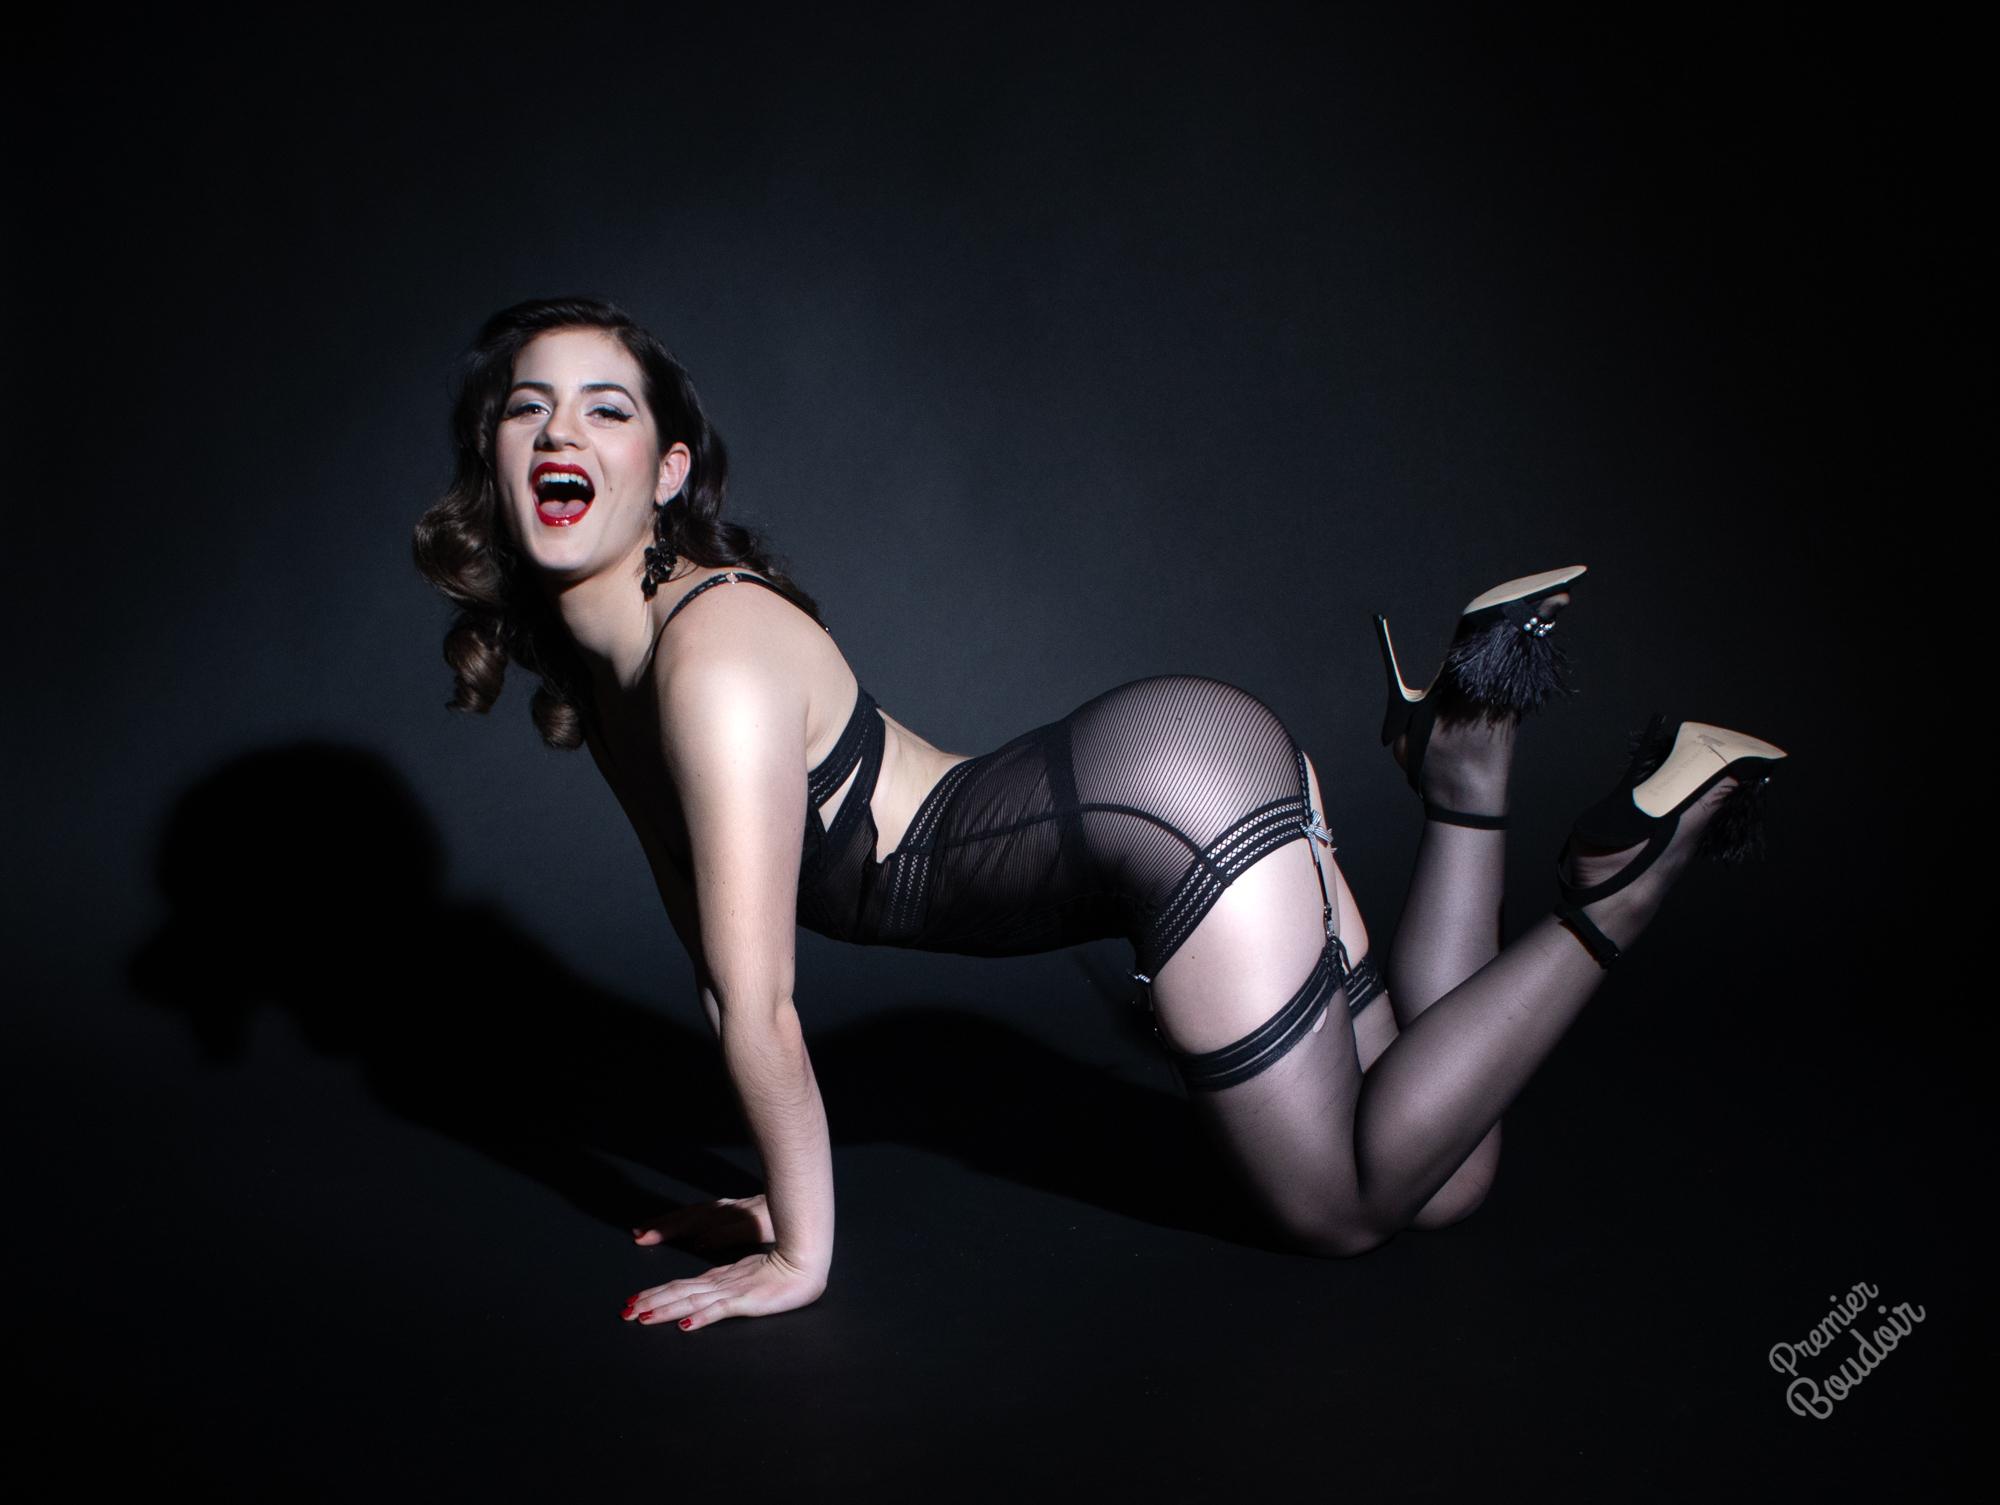 Cleveland Akron Glamour Burlesque Boudoir Photographer